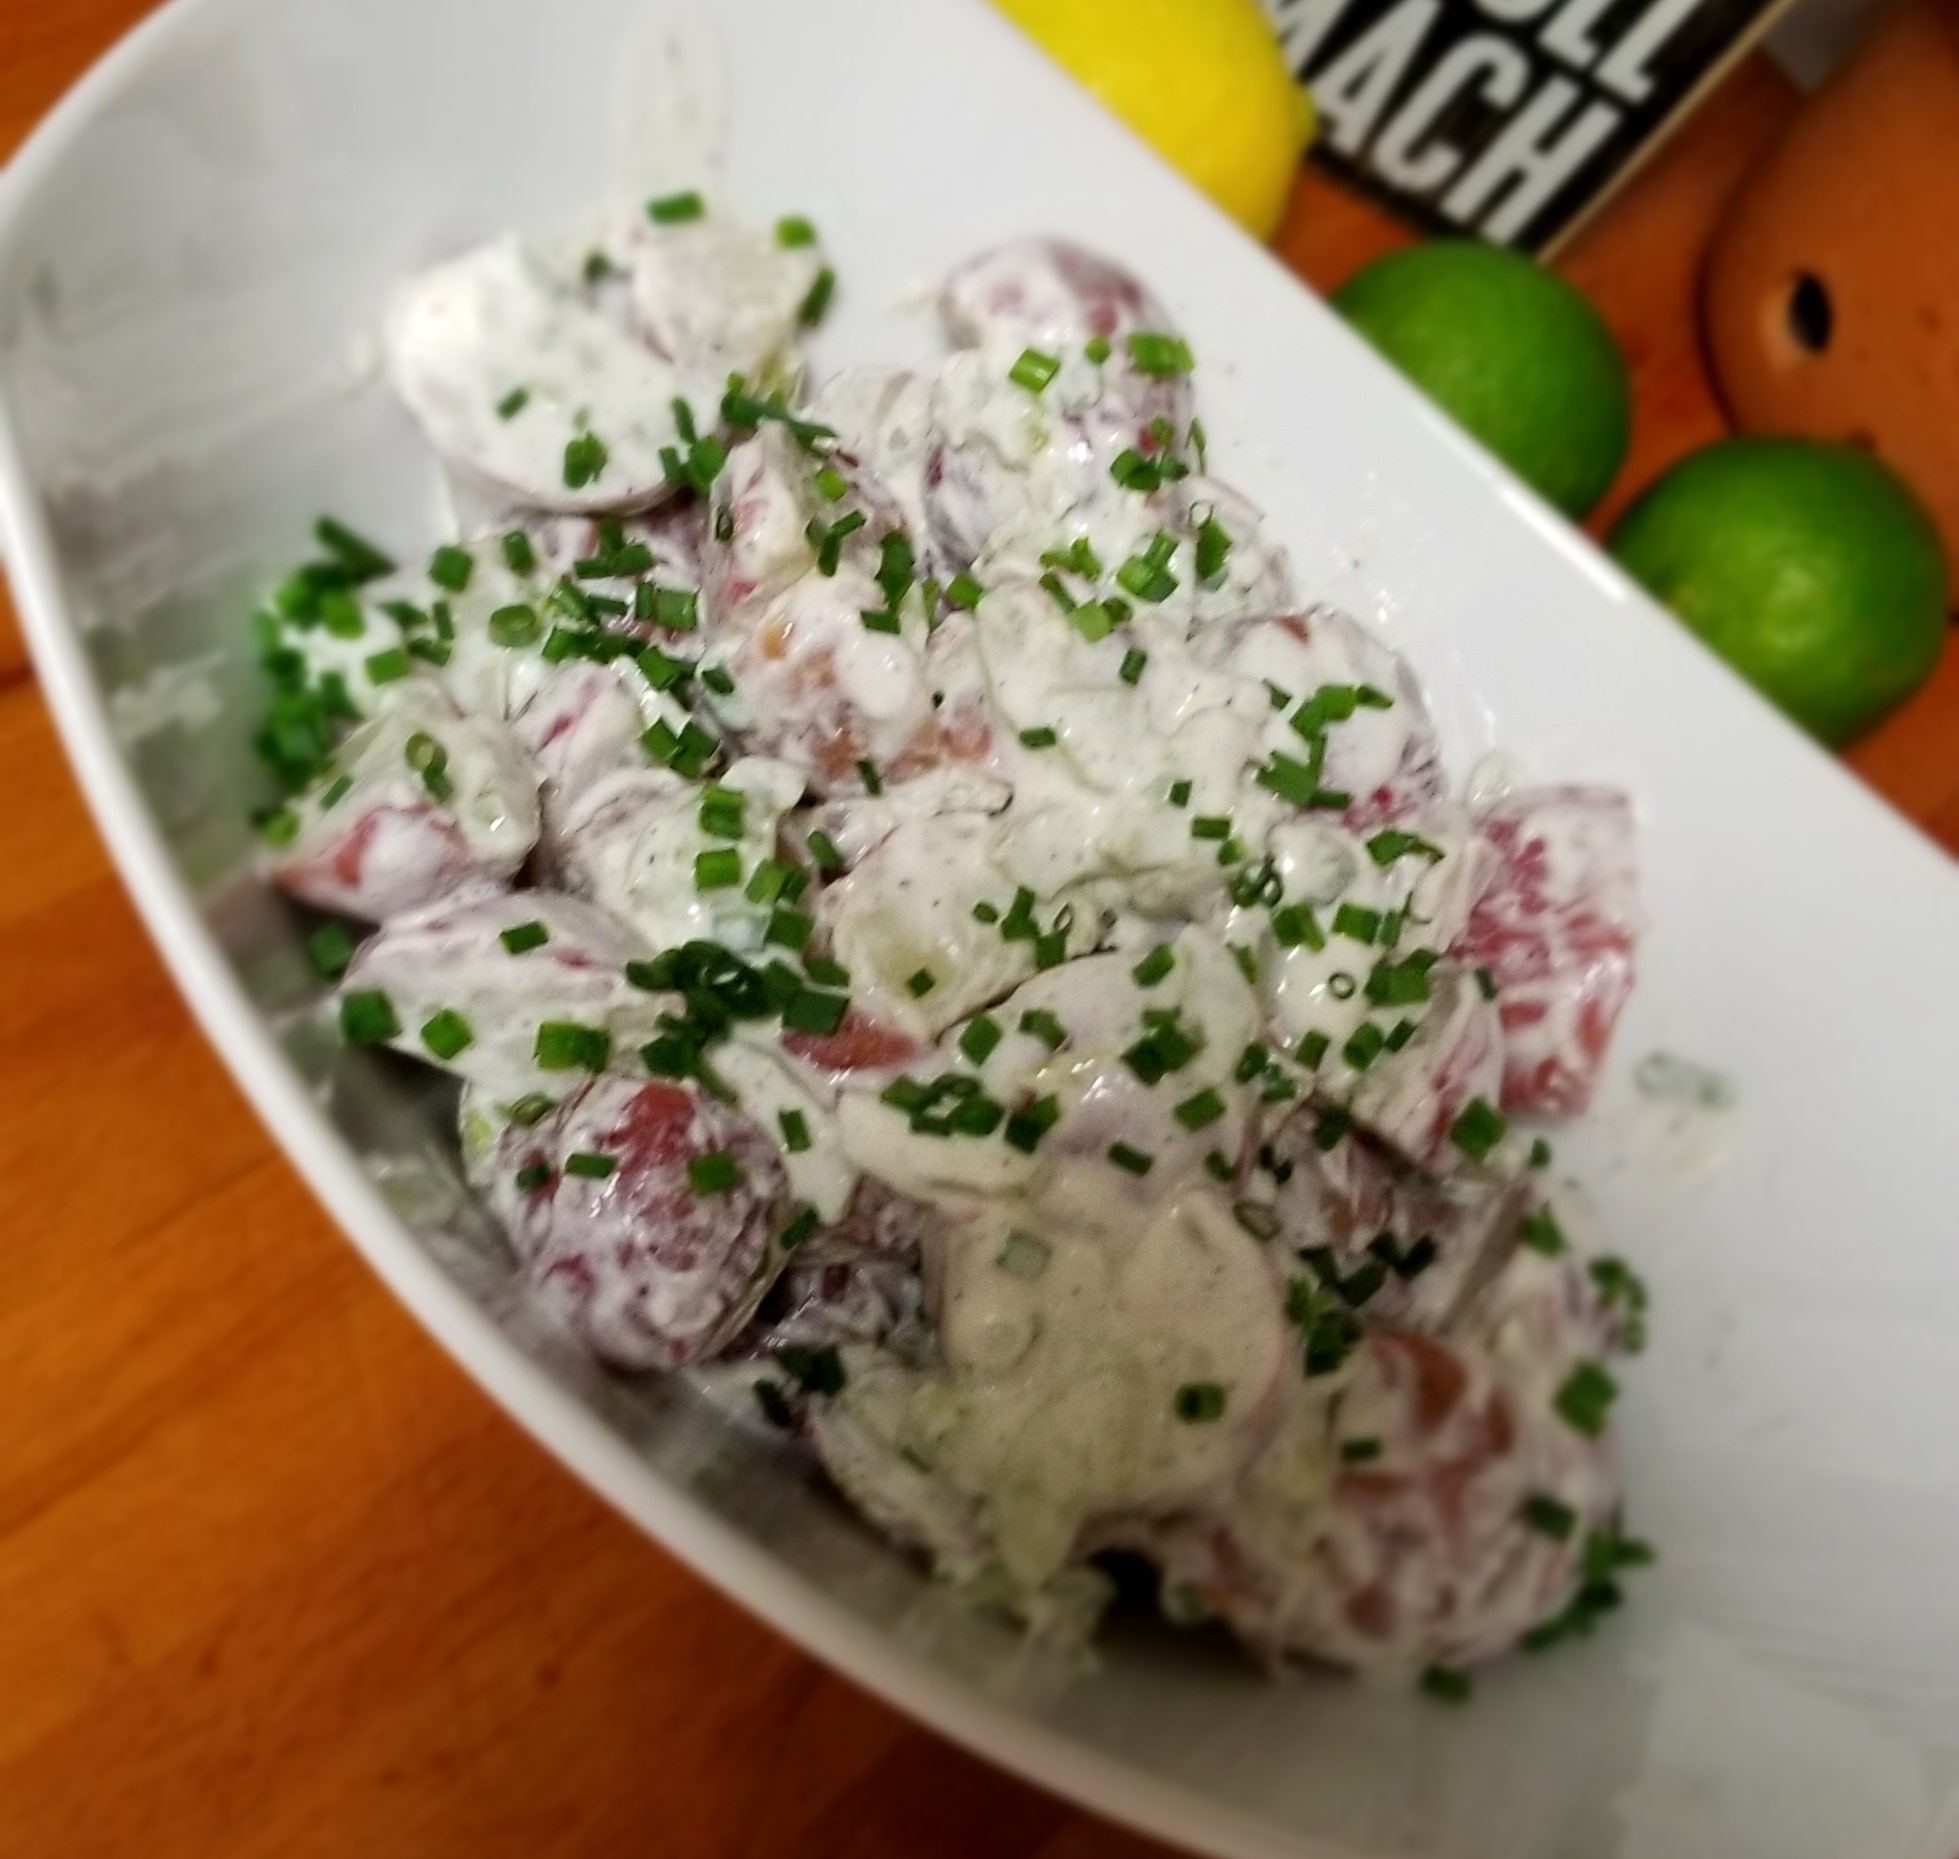 Lemony Creamy Potato Salad with Sour Cream